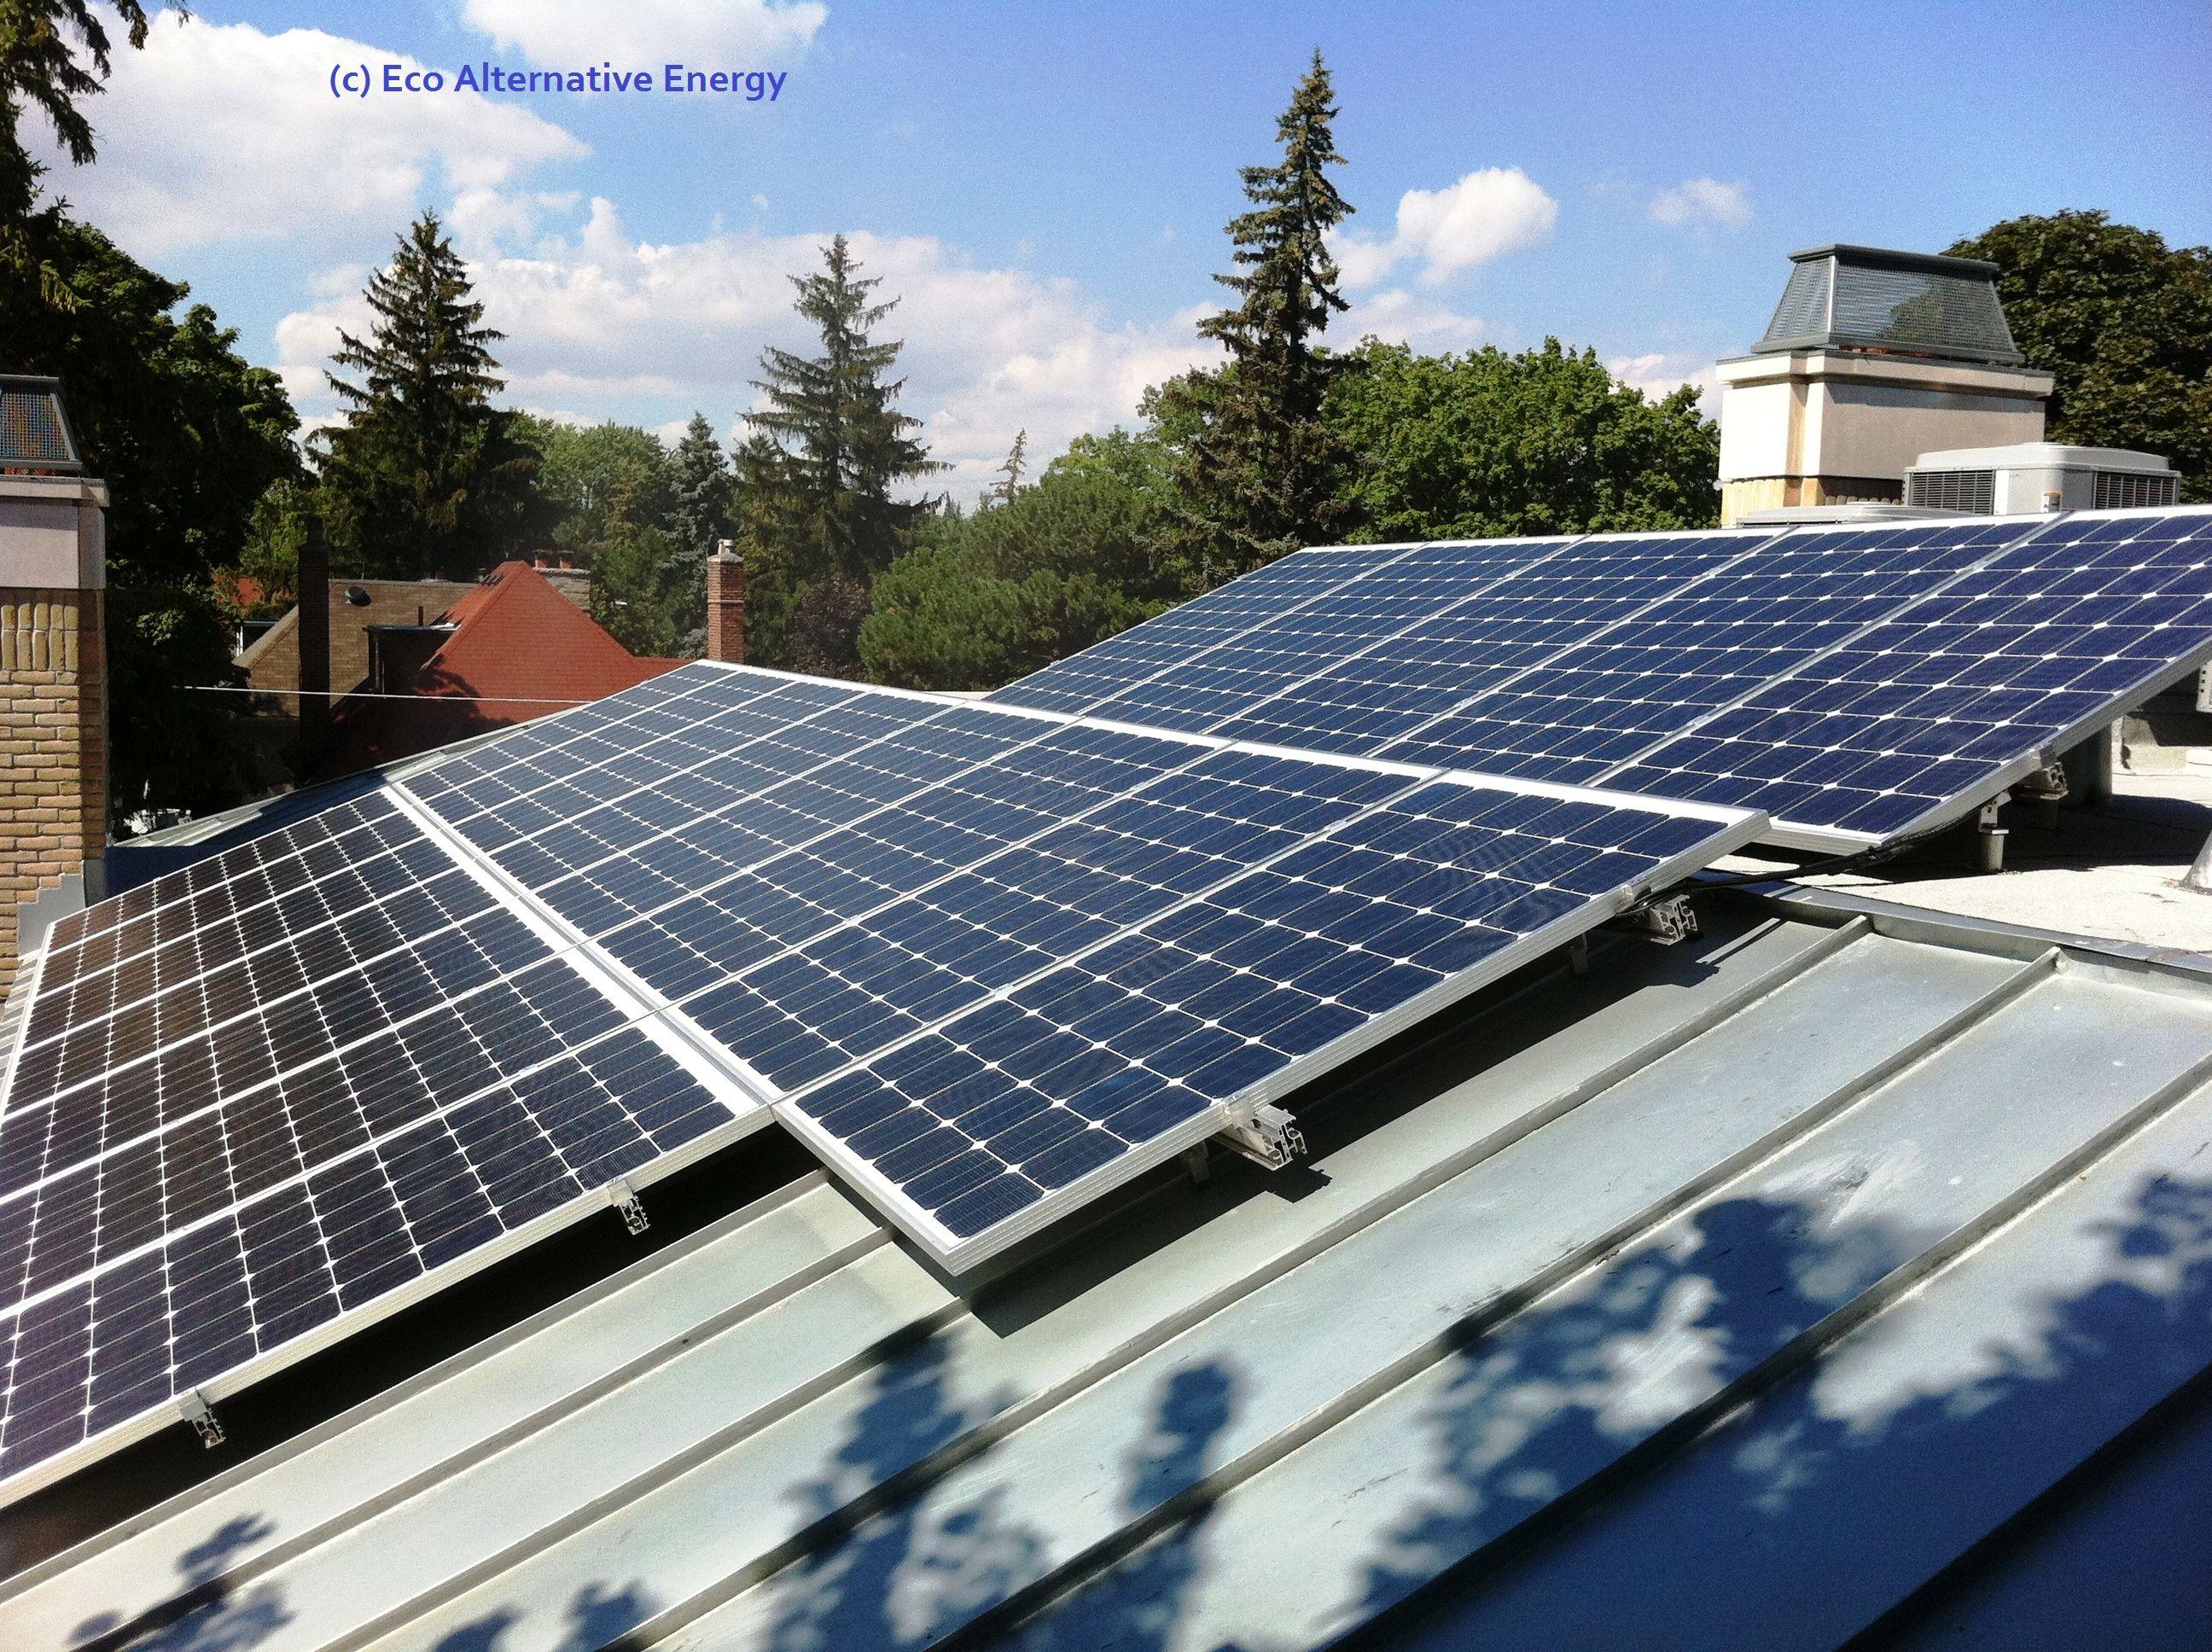 Professional Solar Panel Installation Solarpanelcost Solarpanelroof Homesolarsystem Commercialsolarpane Solar Panels Buy Solar Panels Solar Panels For Sale